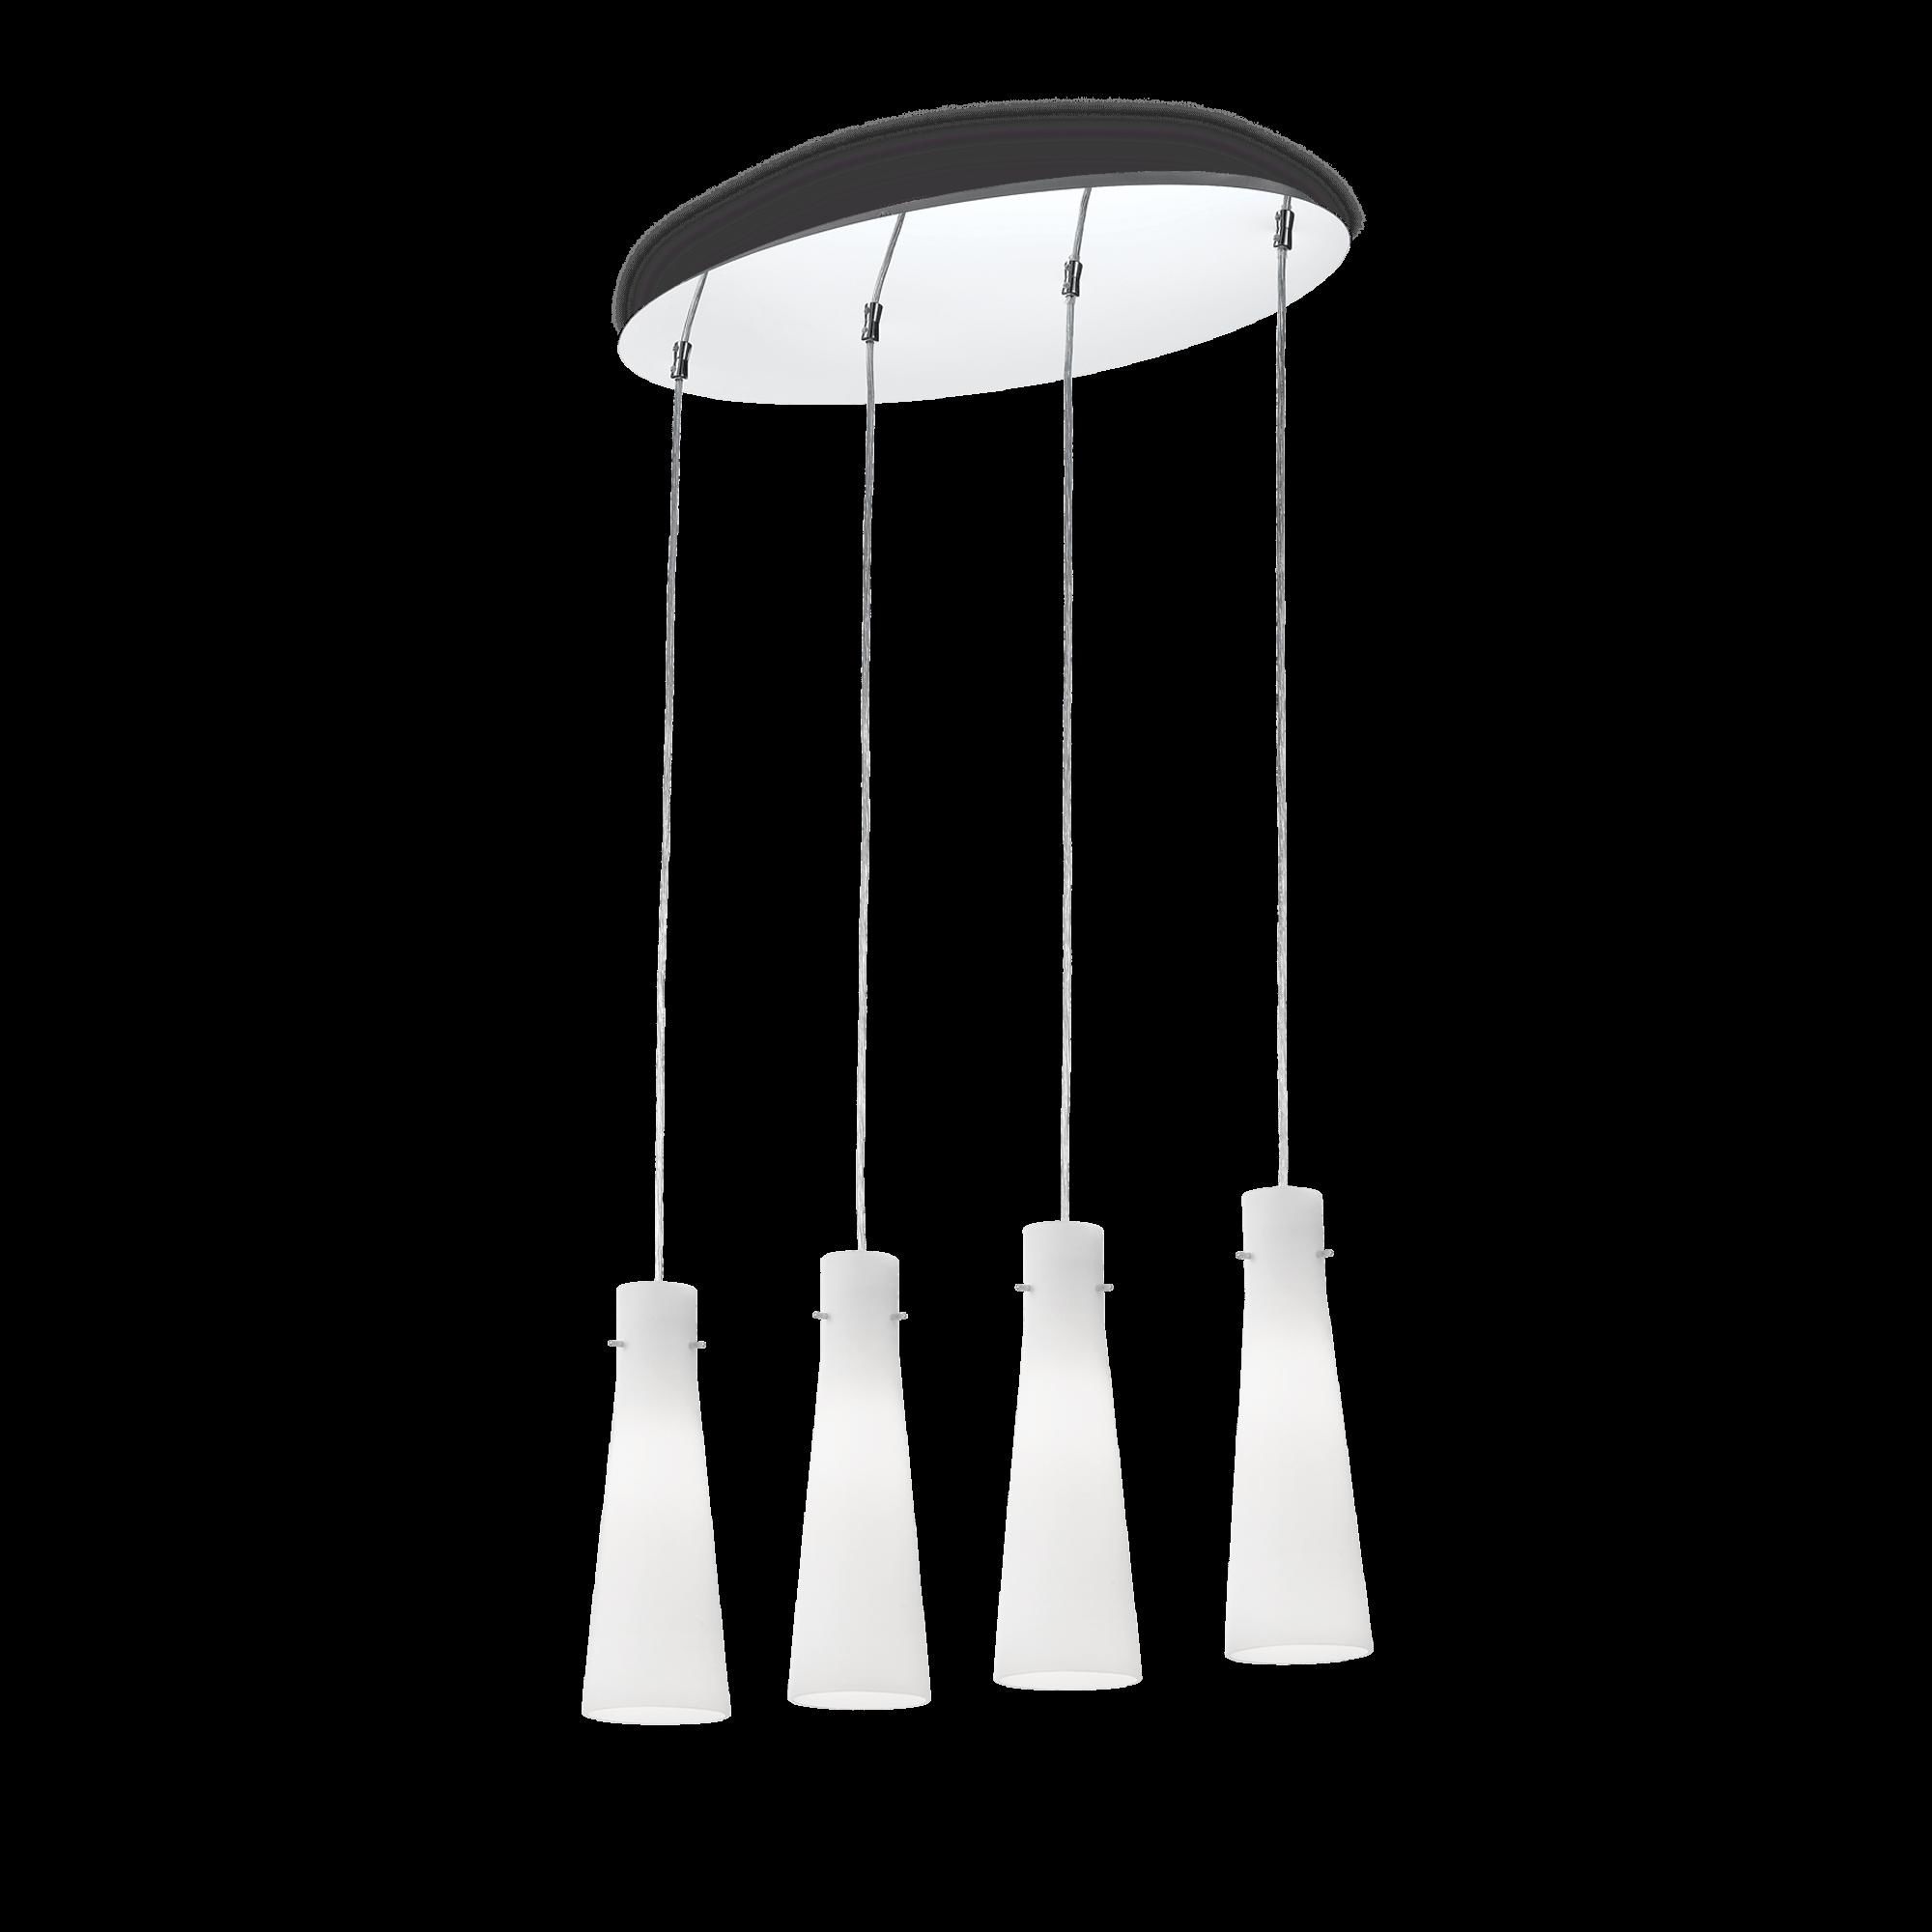 Ideal Lux 053455 Kuky Bianco SP4 függeszték